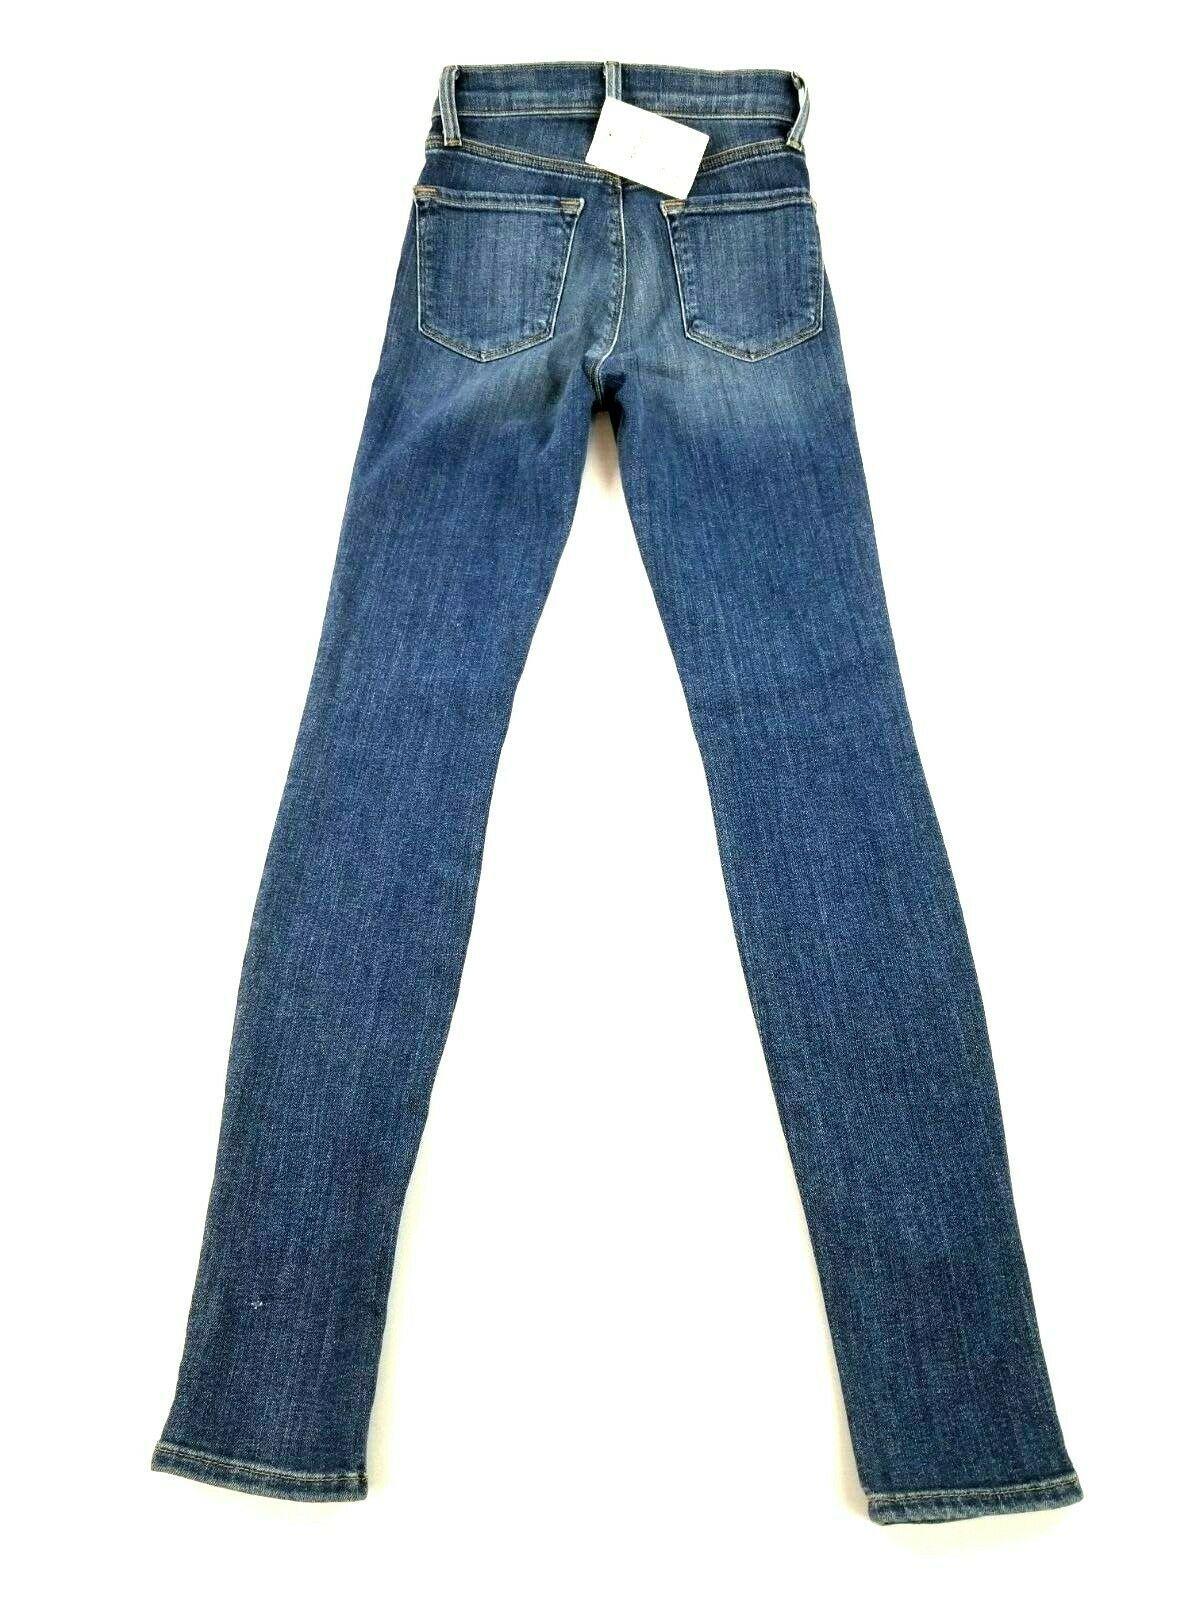 Neuf J Brand Femme Jeans Skinny Maria 23110O212 Divulgation Bleu Sz 22 Pdsf image 7